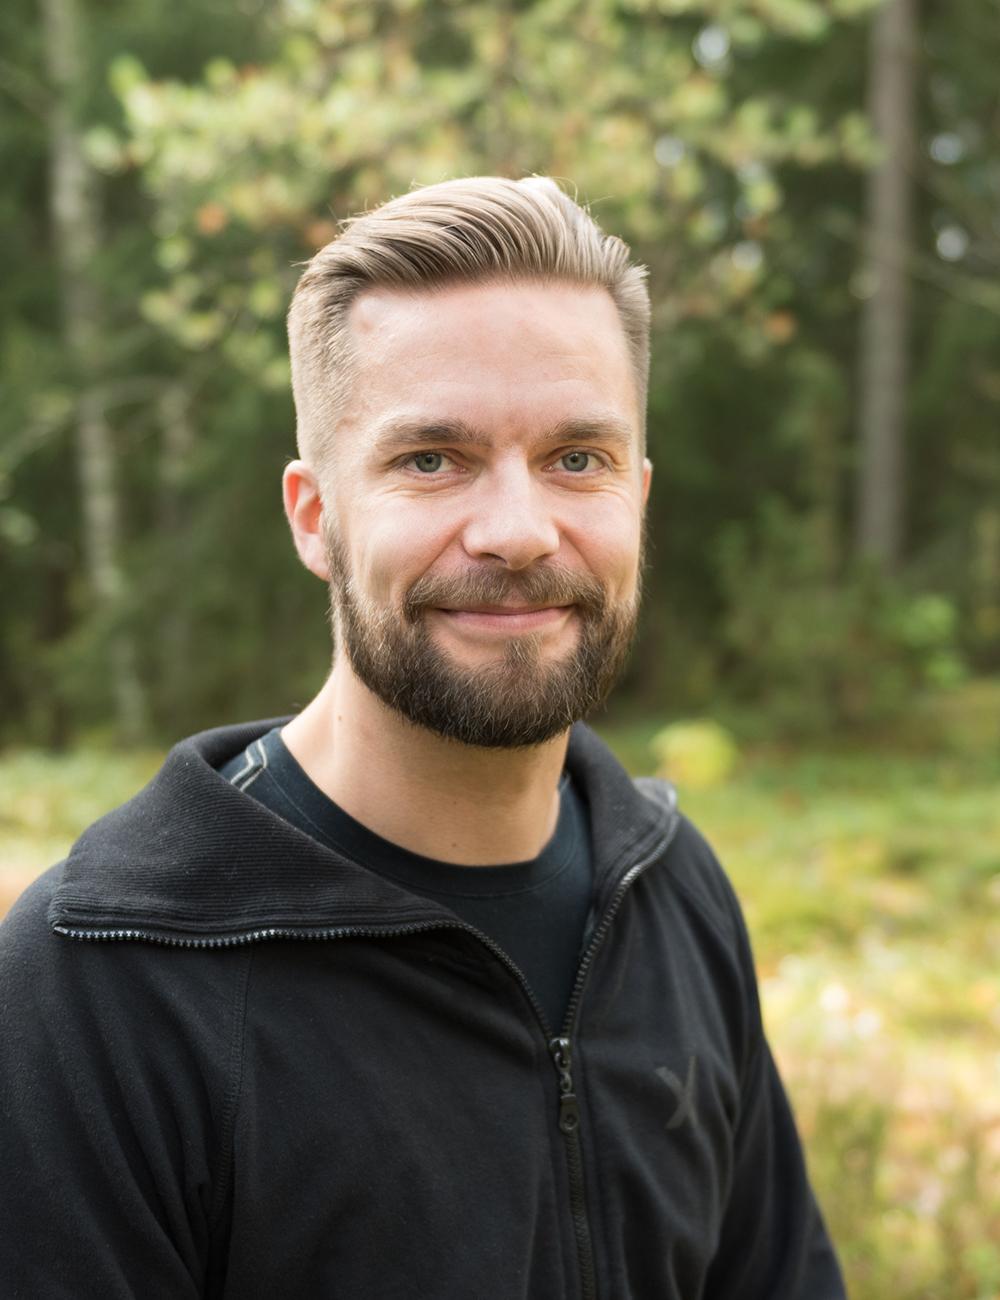 Petrus Liukkonen